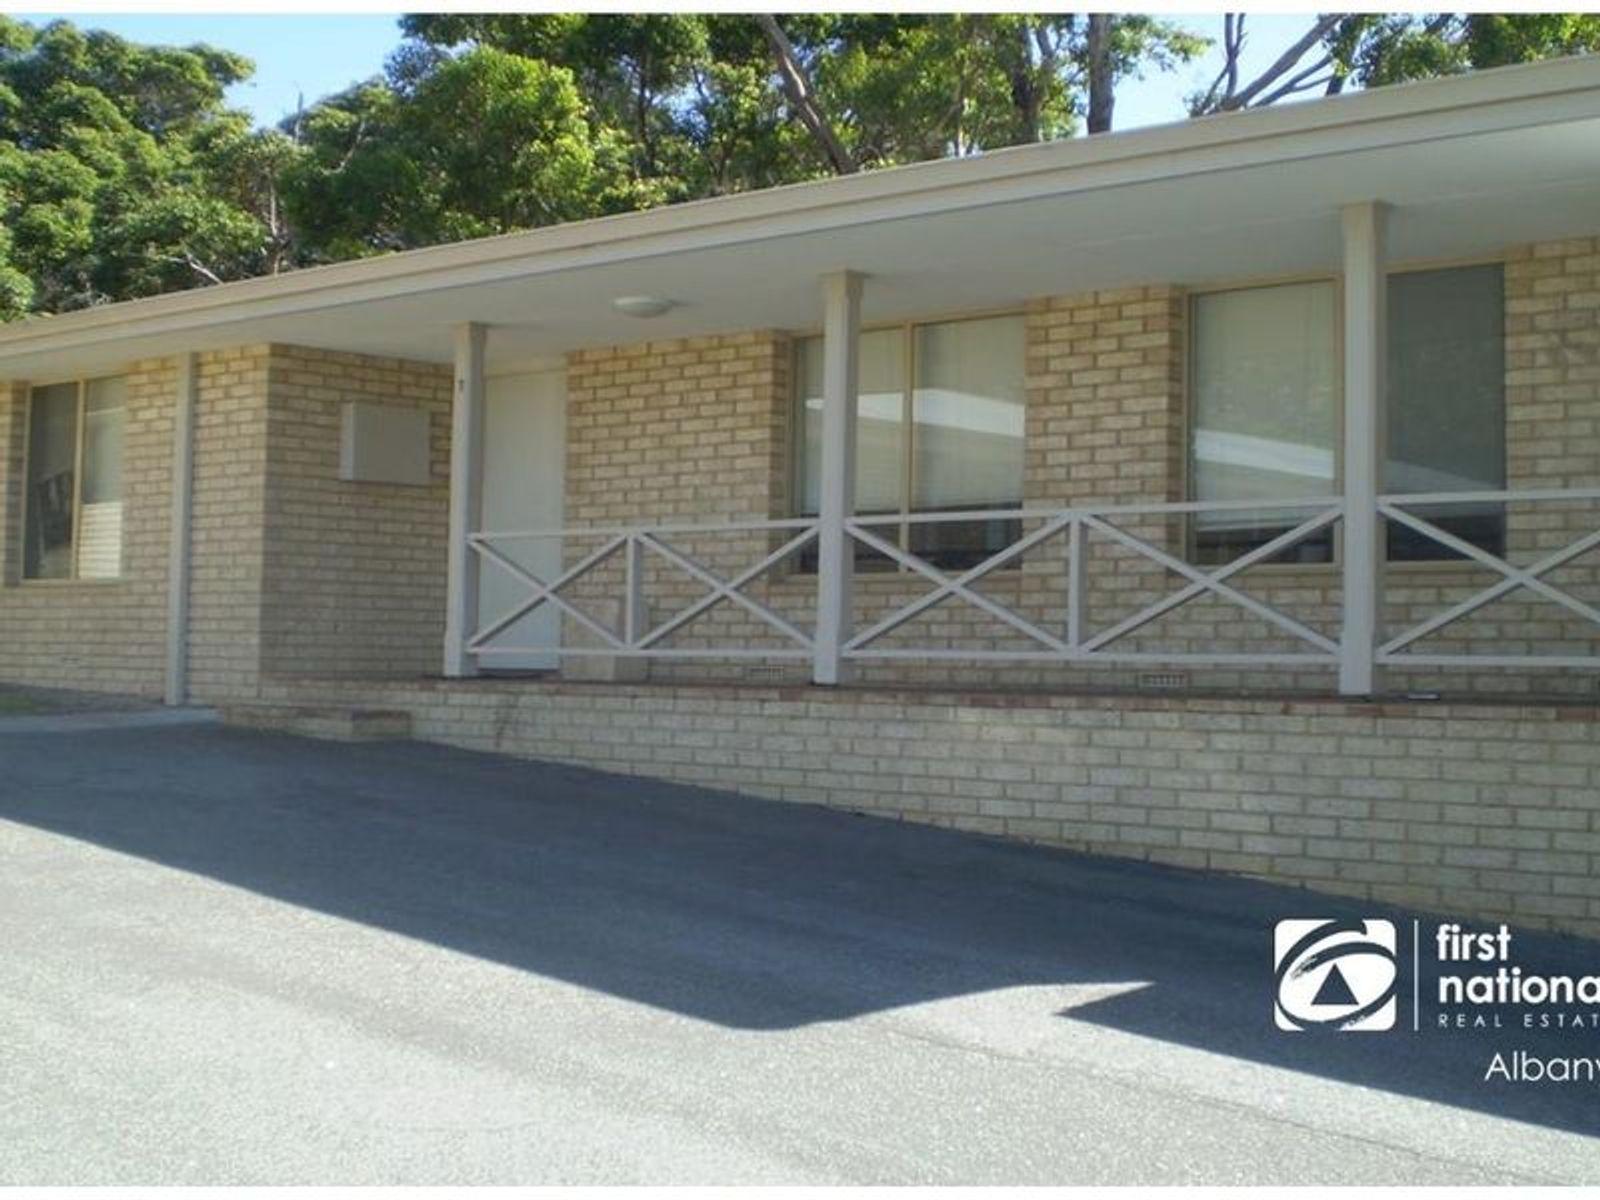 7/199 Middleton Beach Road, Mount Clarence, WA 6330